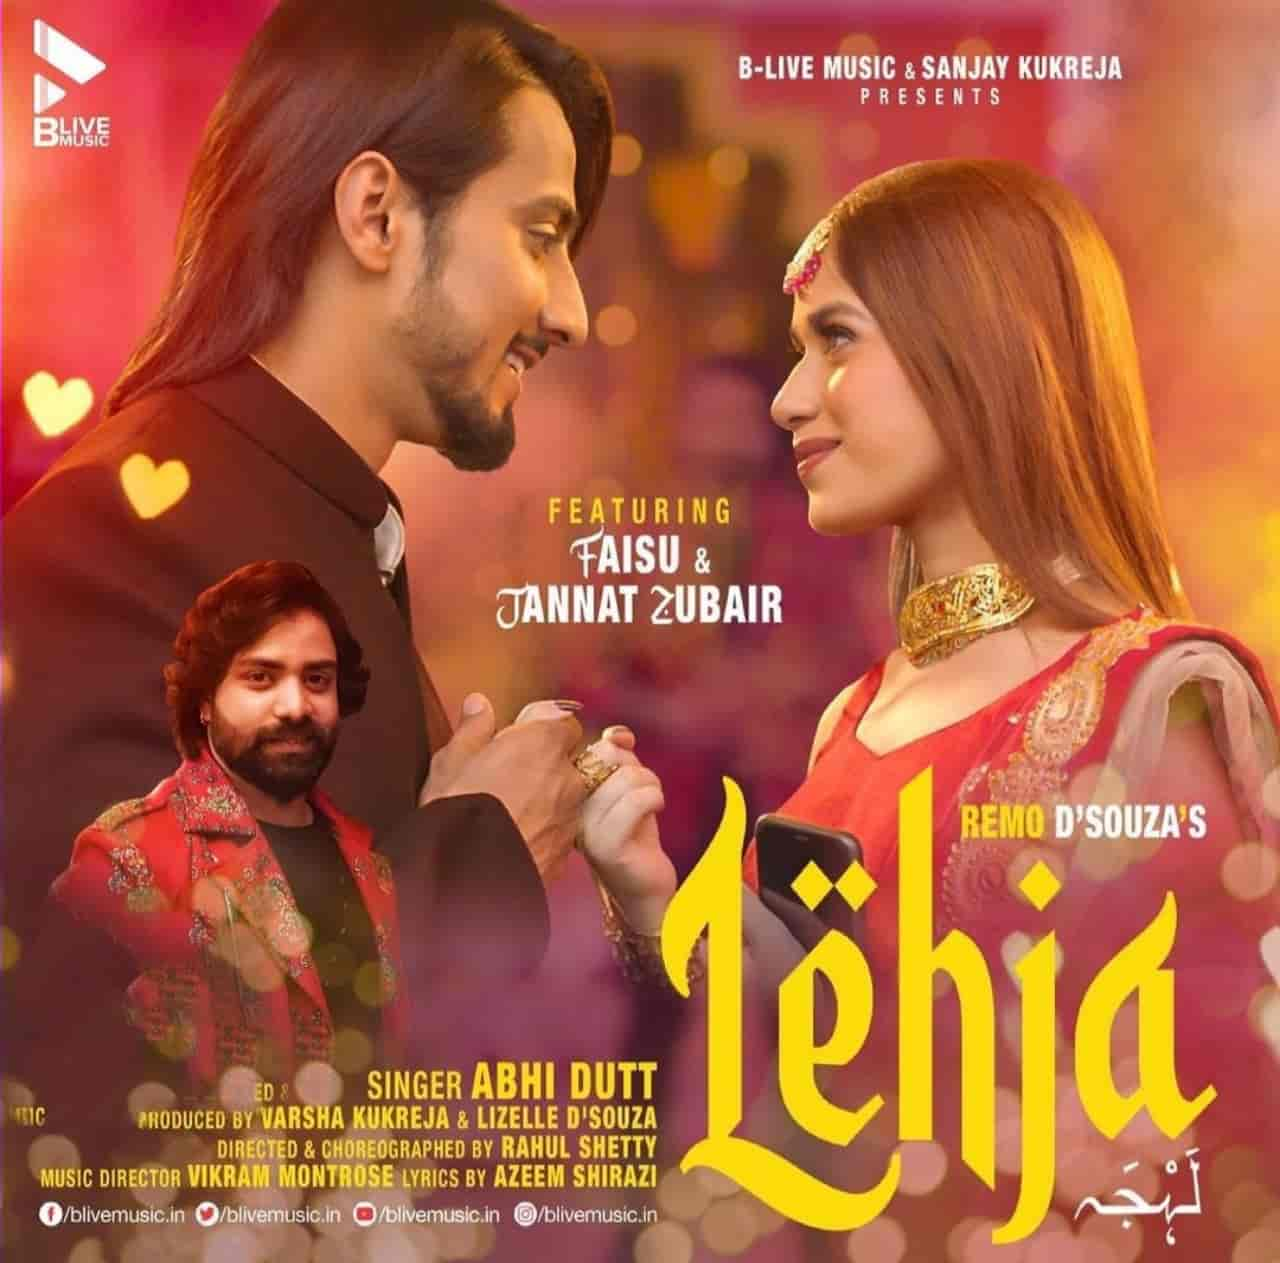 Lehja Hindi Song Image Jannat Zubair